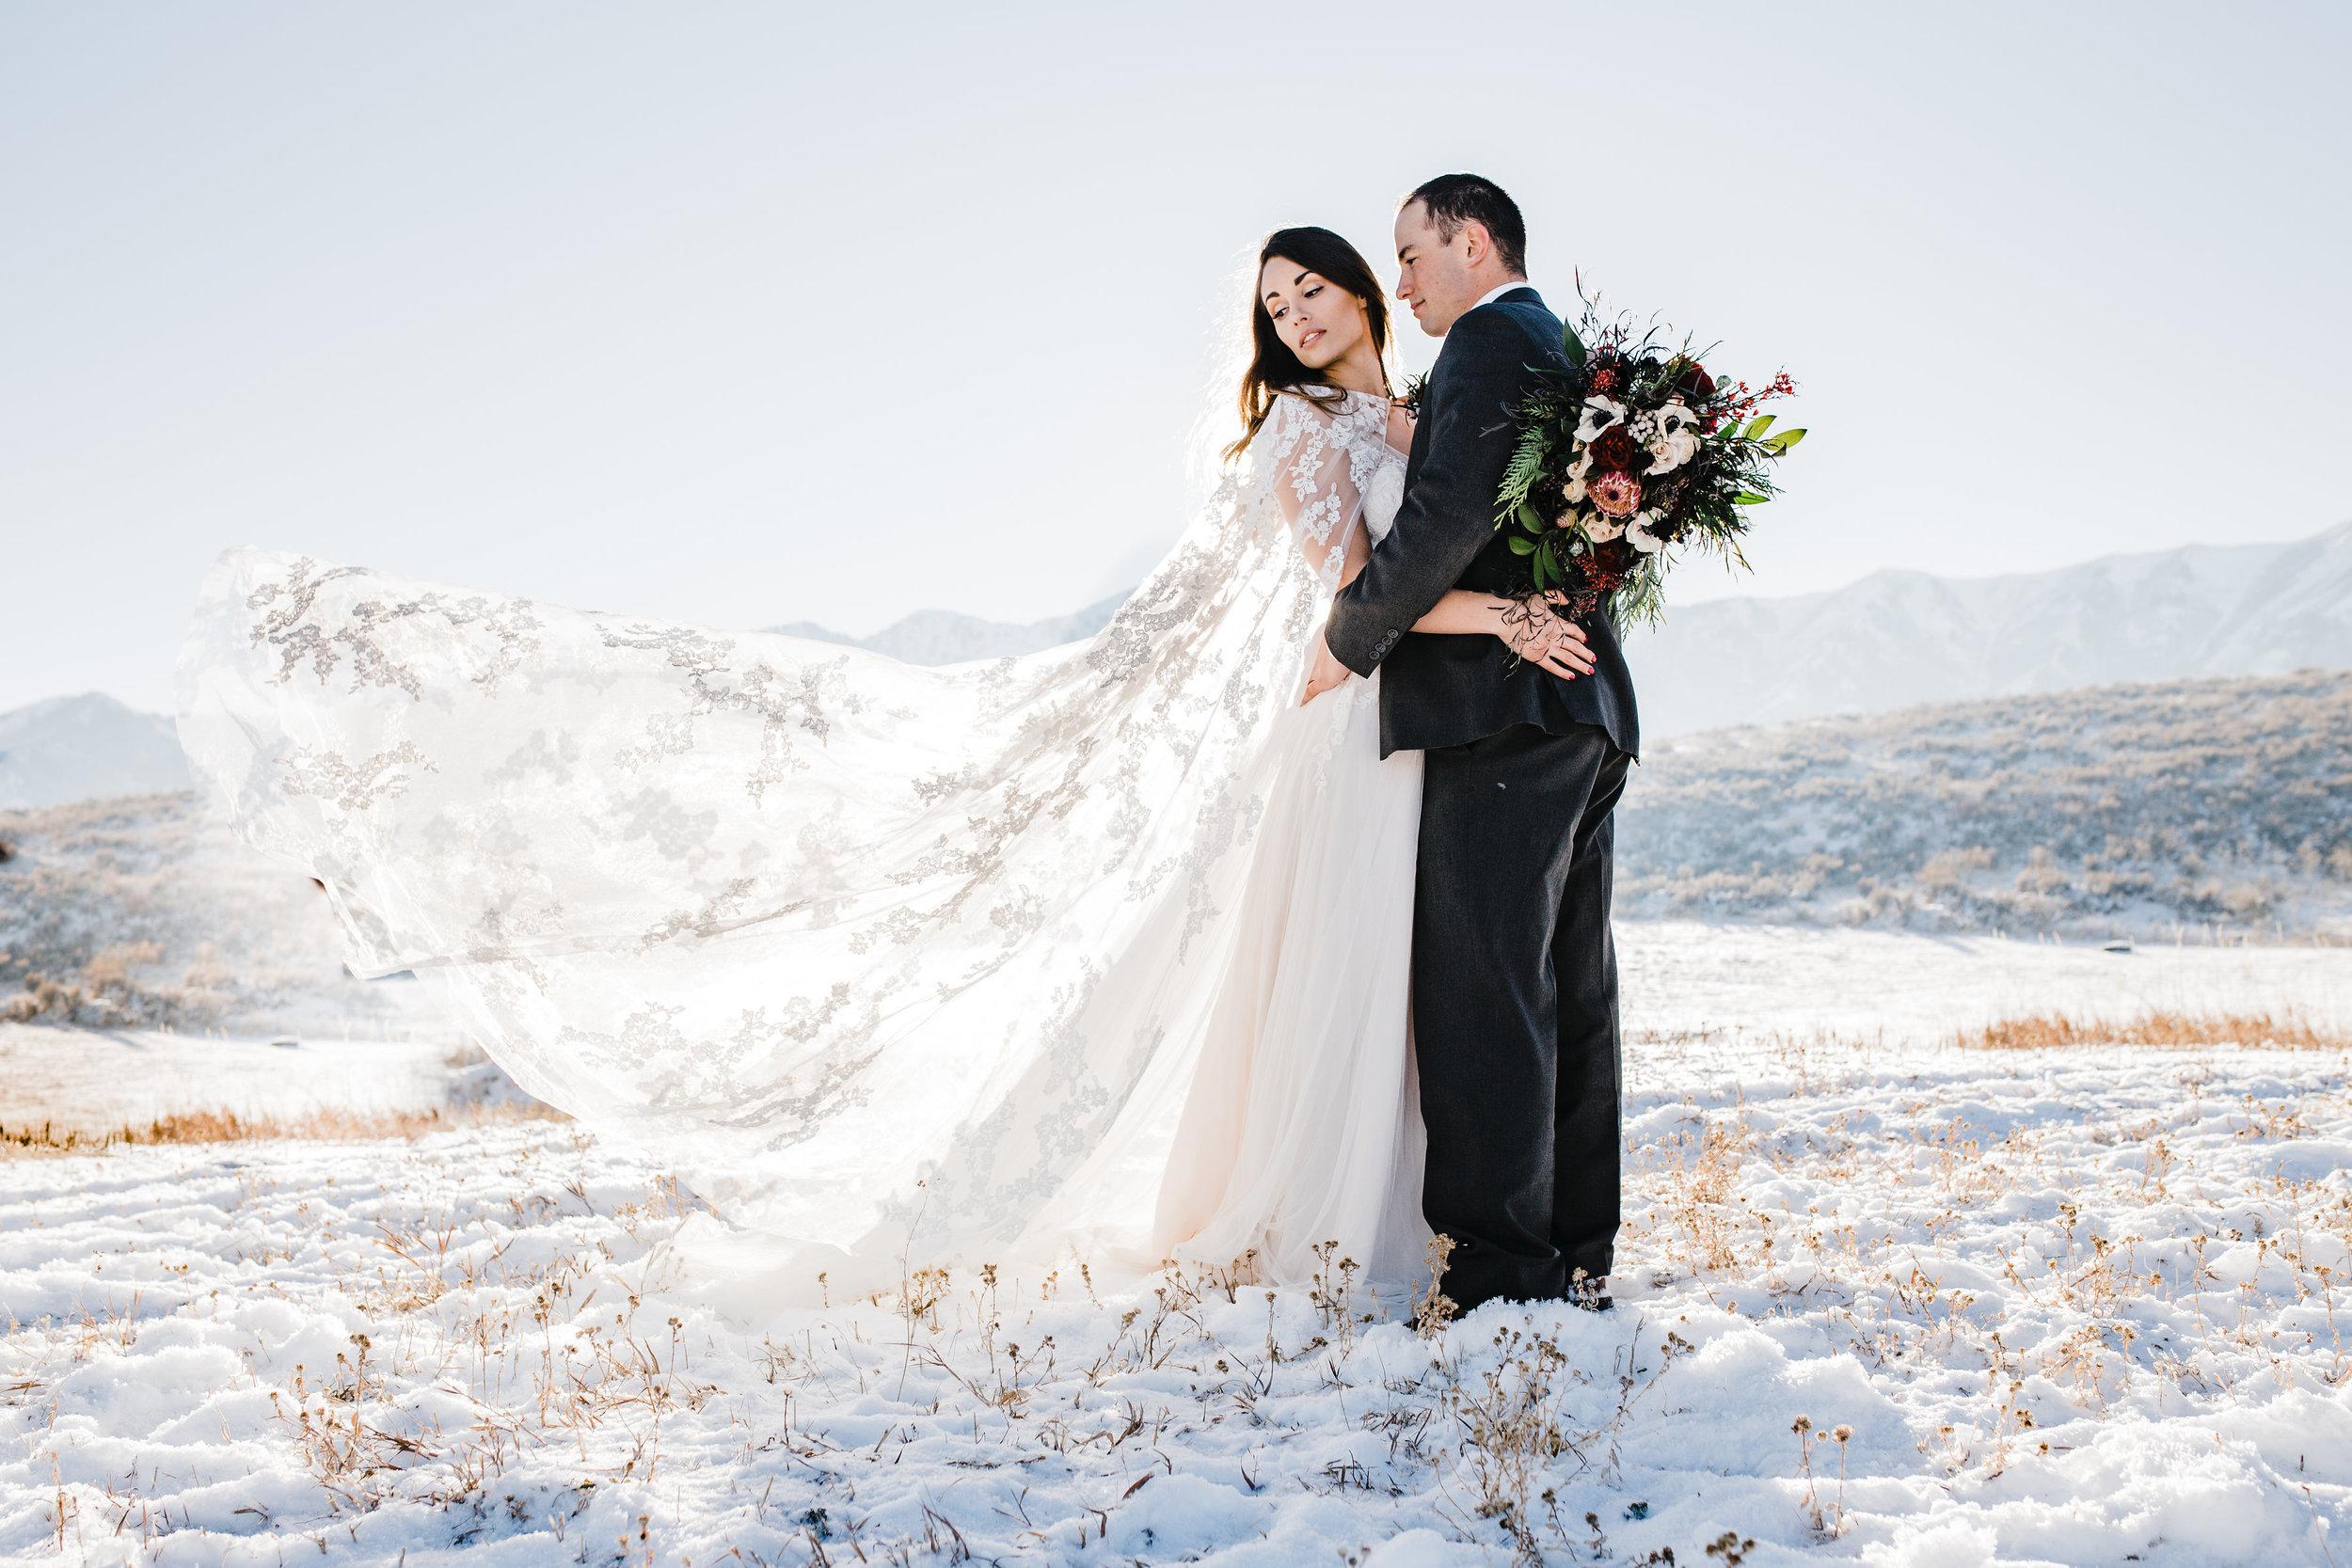 styled shoot wedding photographer logan utah